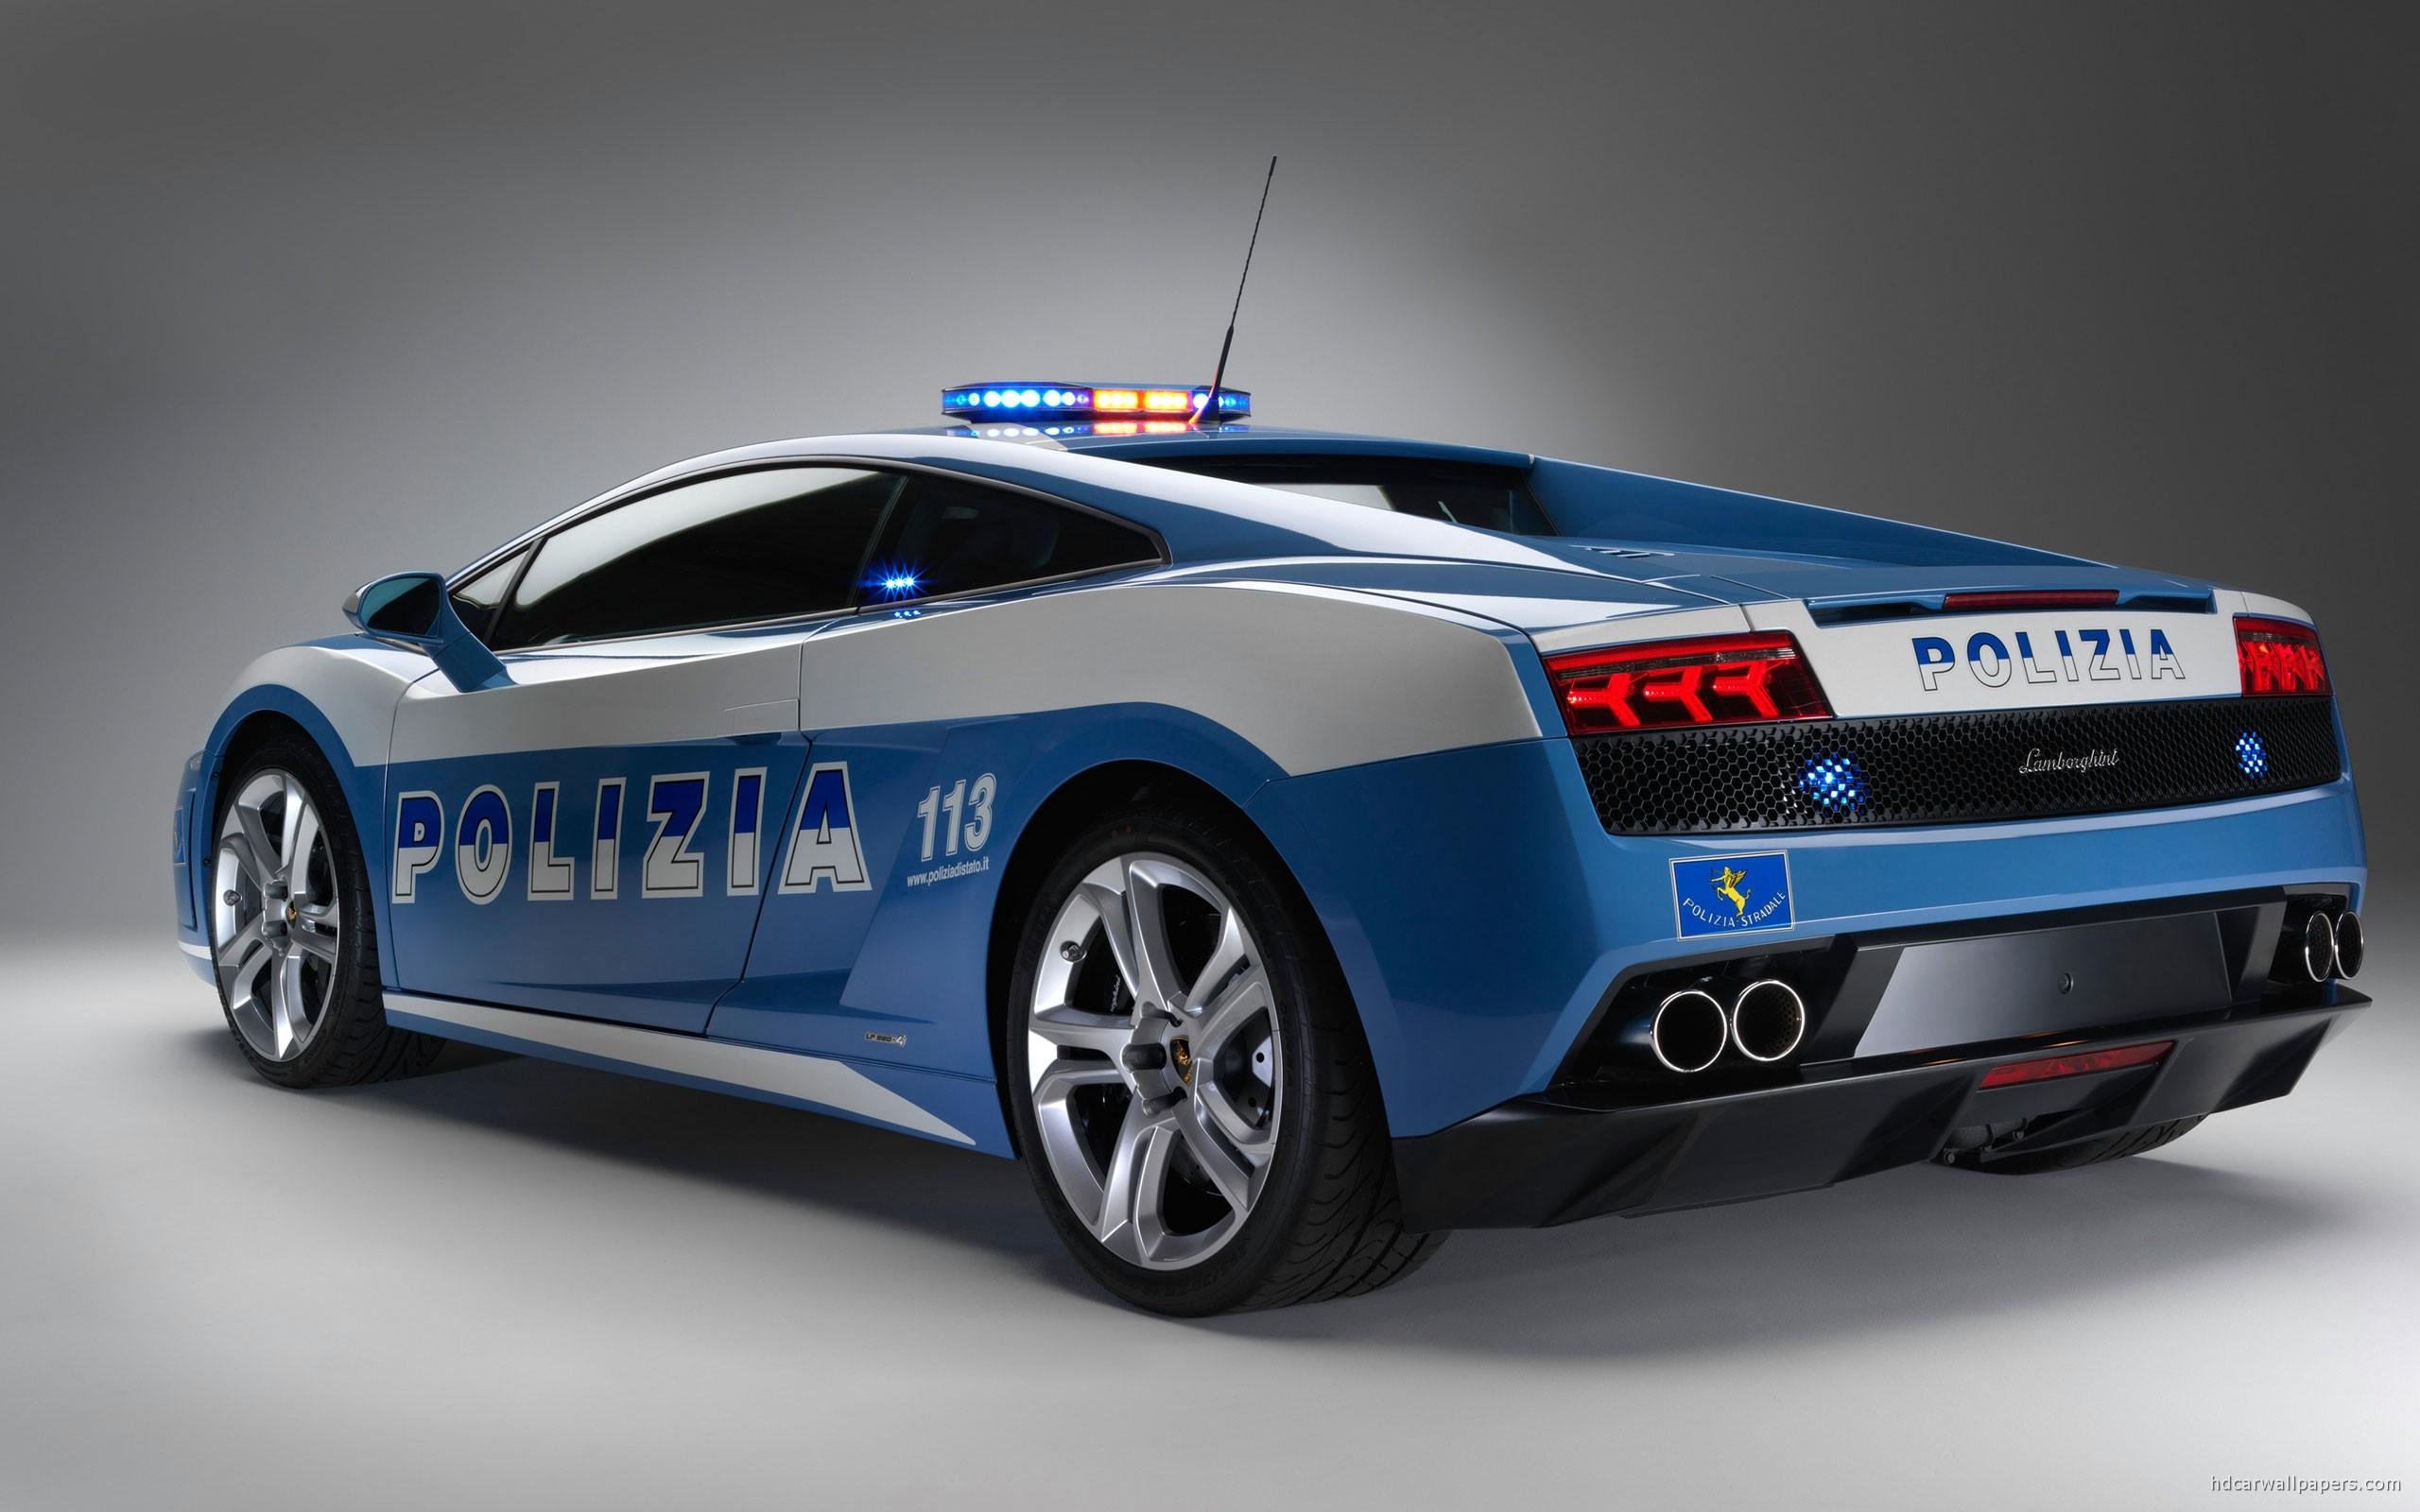 Lamborghini Gallardo Police Car Wallpaper | HD Car Wallpapers